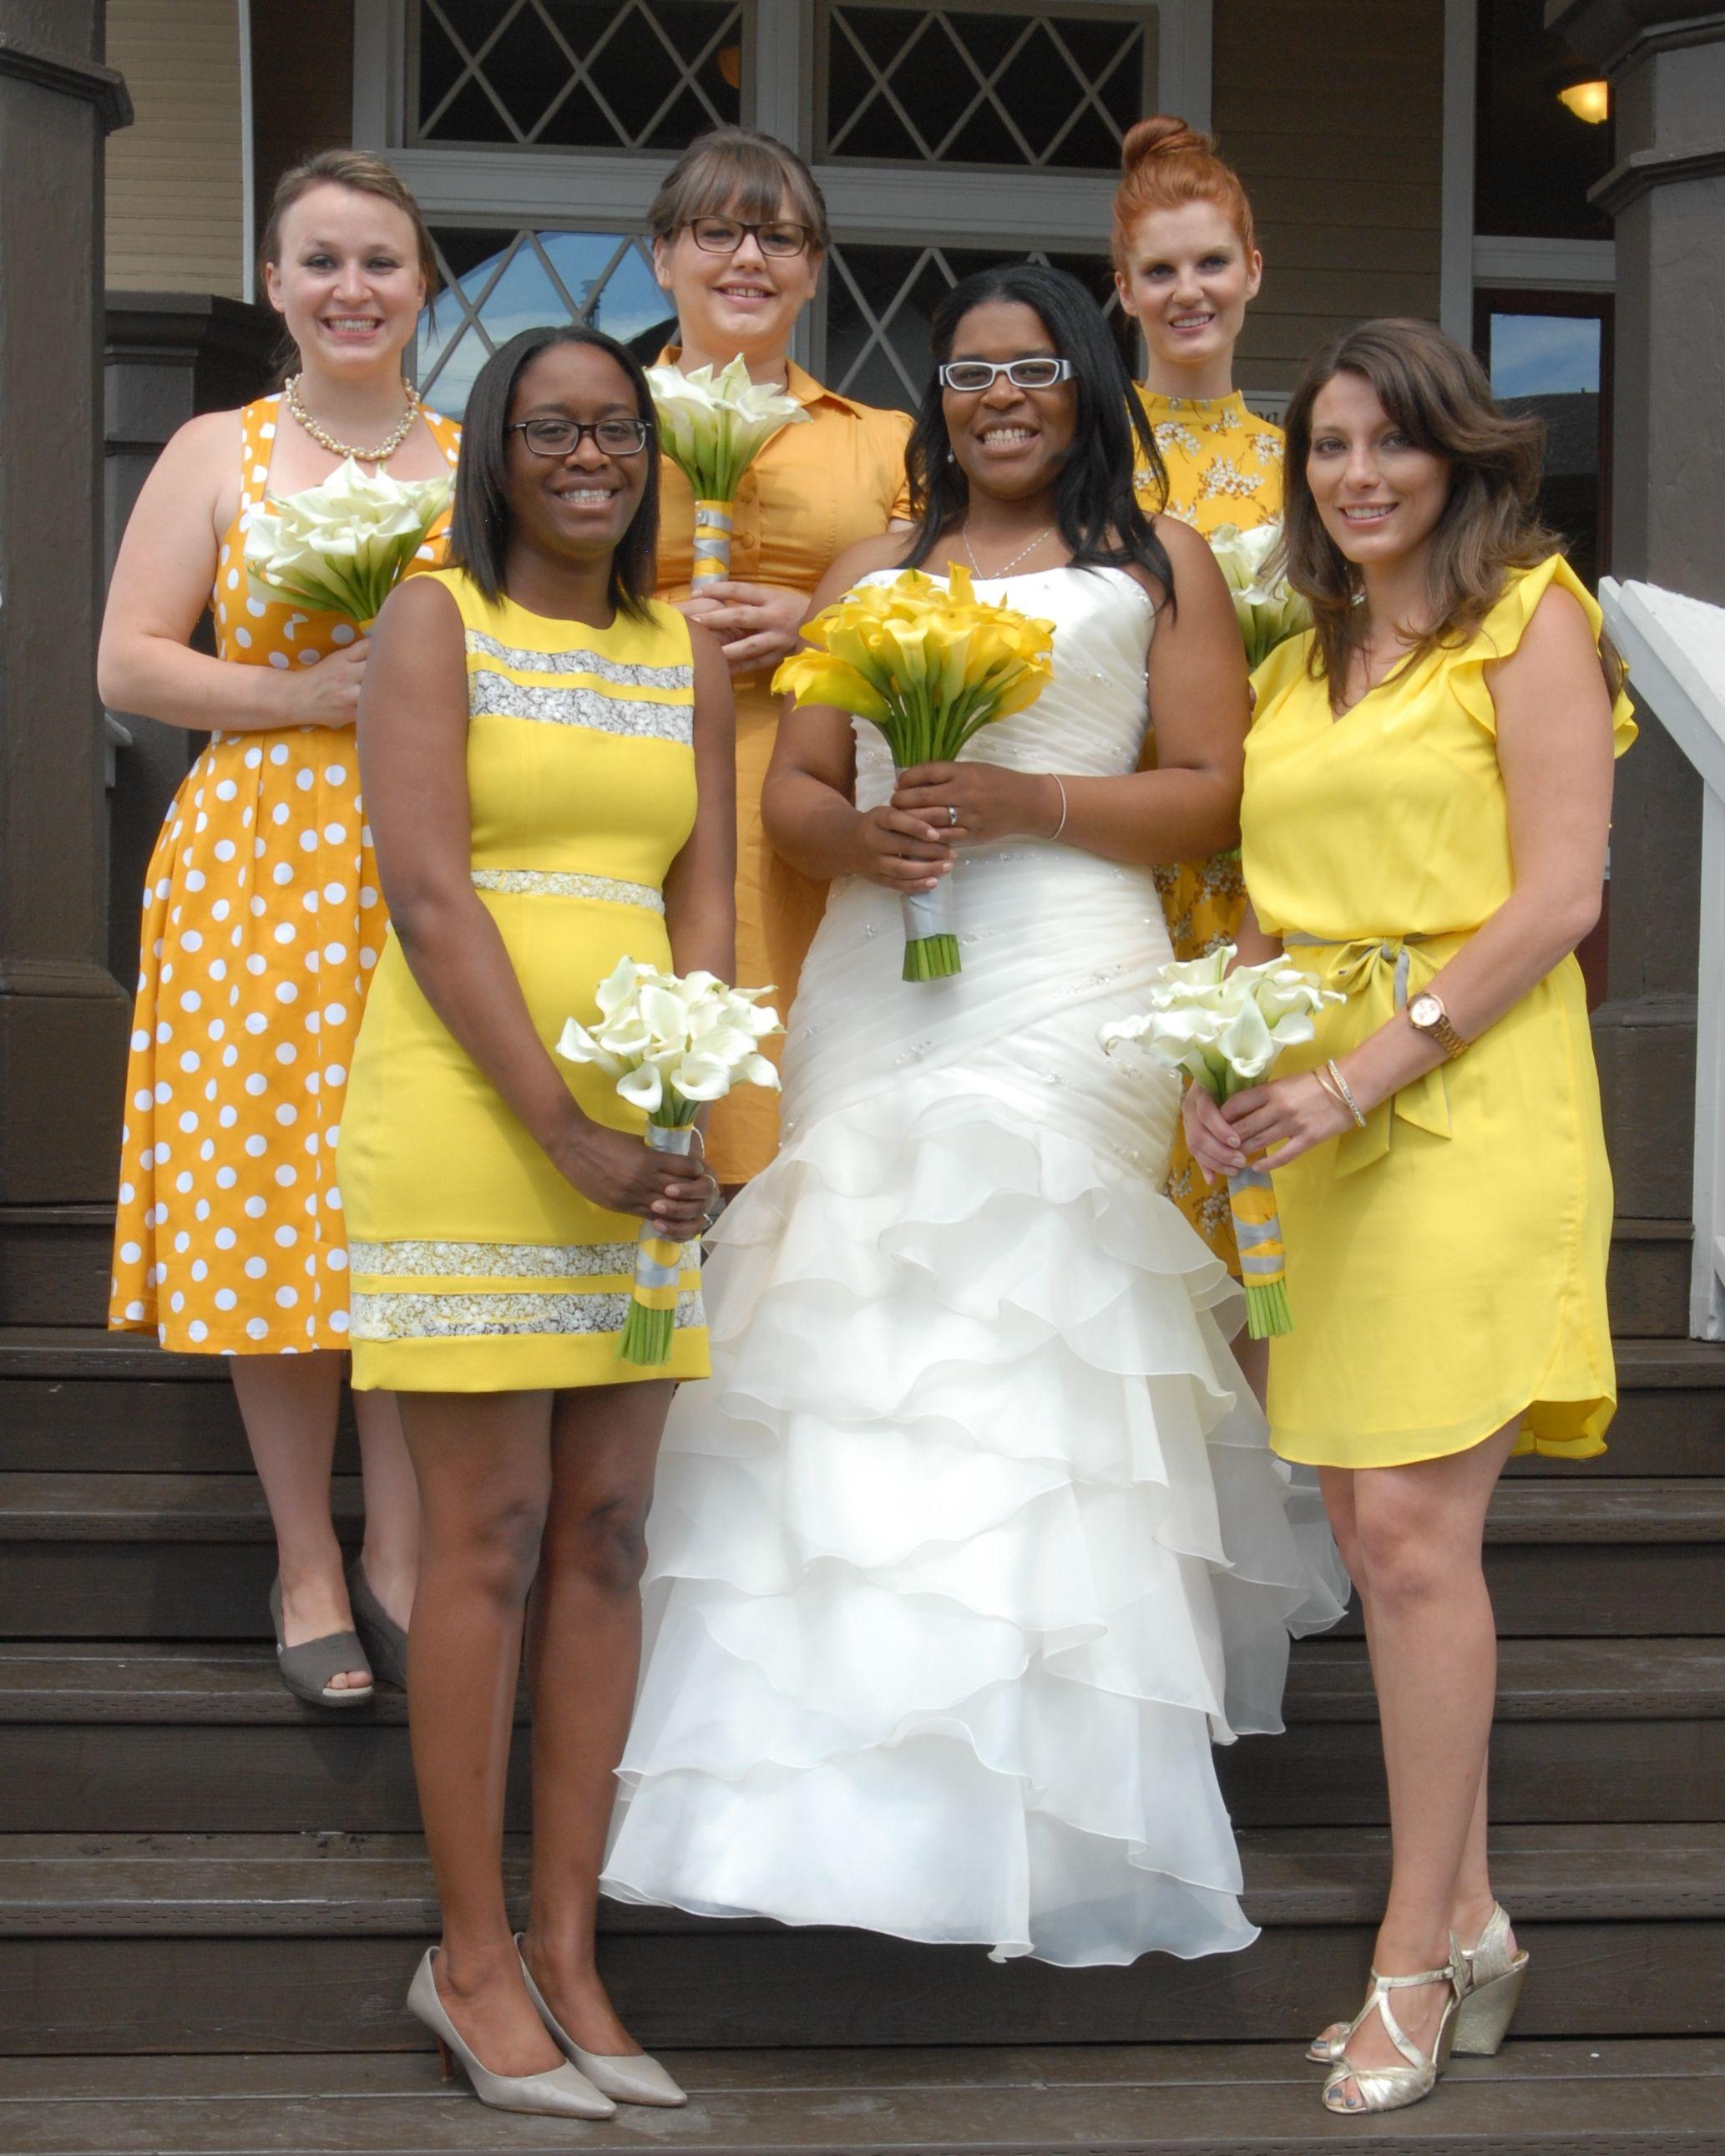 Yellow Bridesmaid S Dresses Their Choice Yellow Bridesmaids Bridesmaid Dresses Yellow Bridesmaid Dresses [ 2582 x 2066 Pixel ]